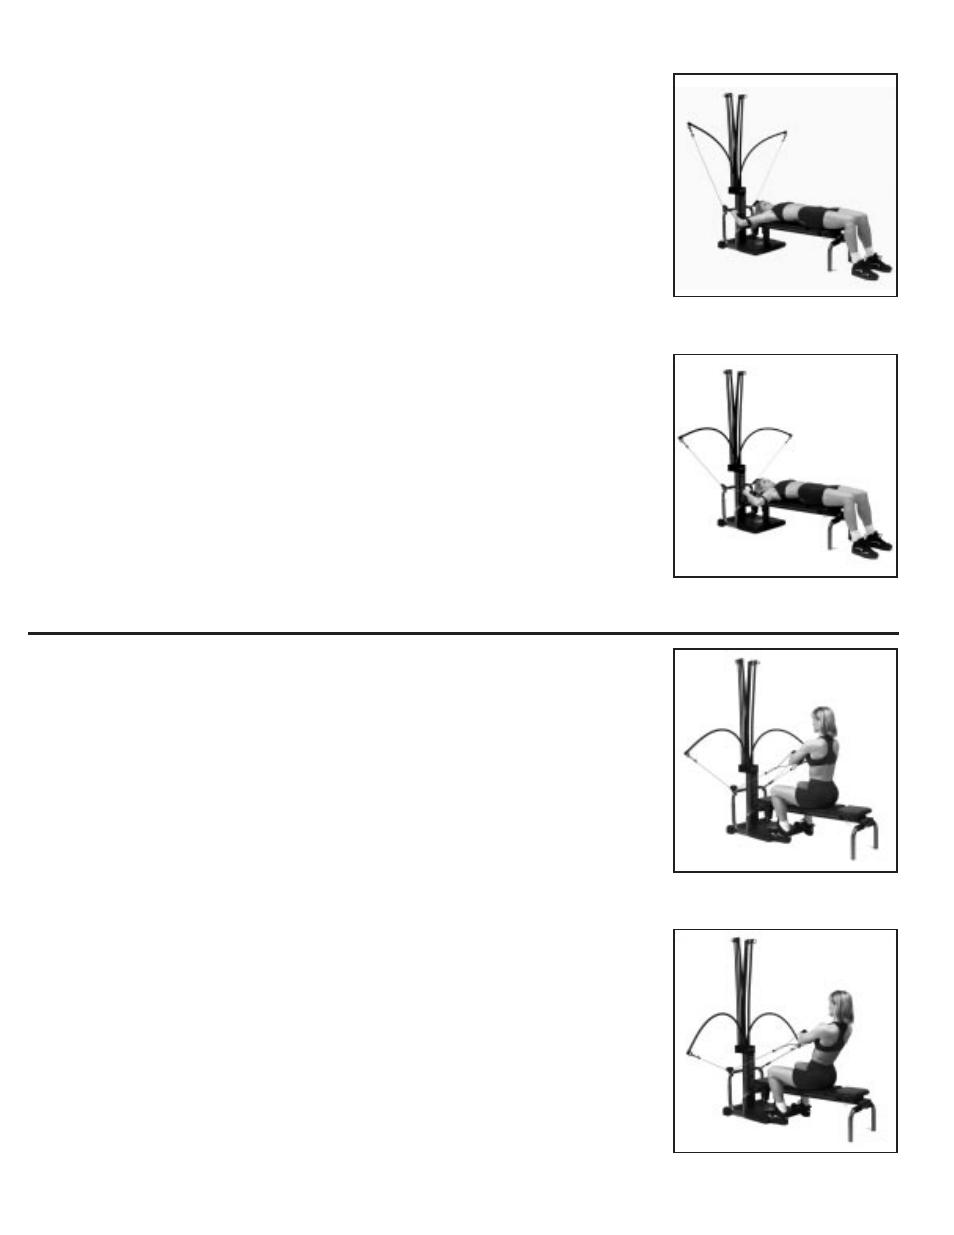 back exercises bowflex xtl user manual page 31 80 original mode rh manualsdir com Instruction Manual Operators Manual